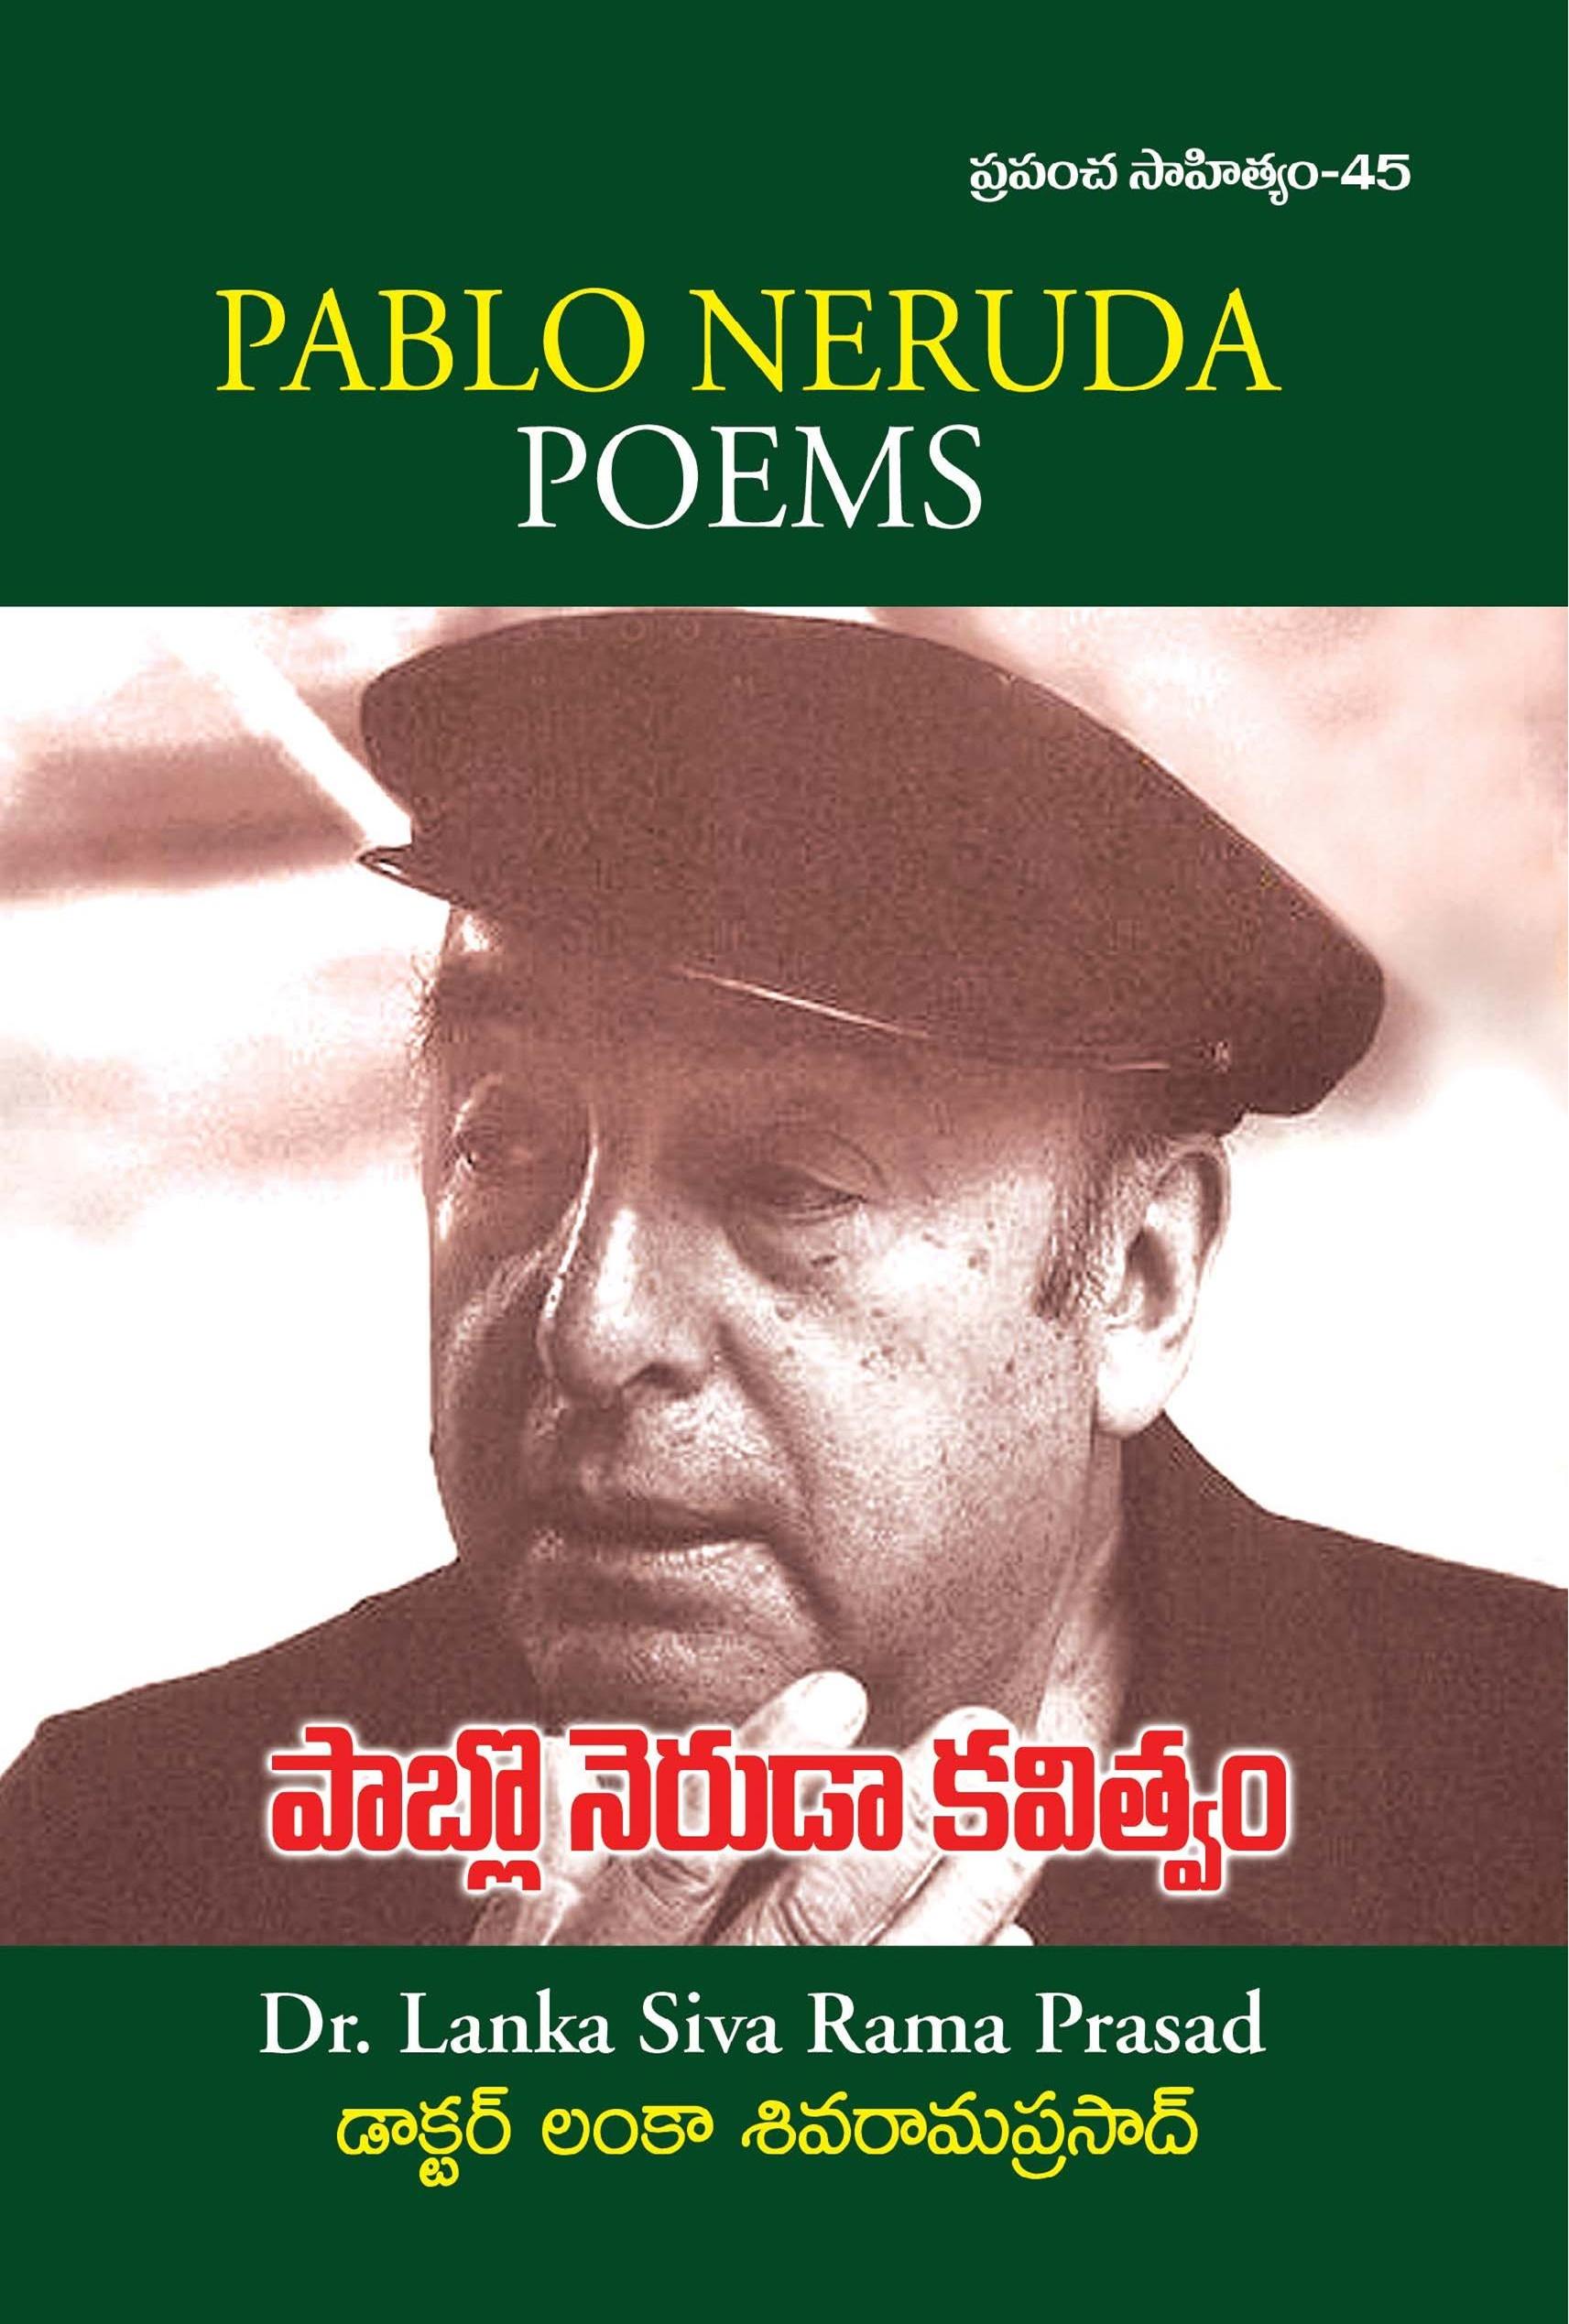 Pablo Neruda's Poems